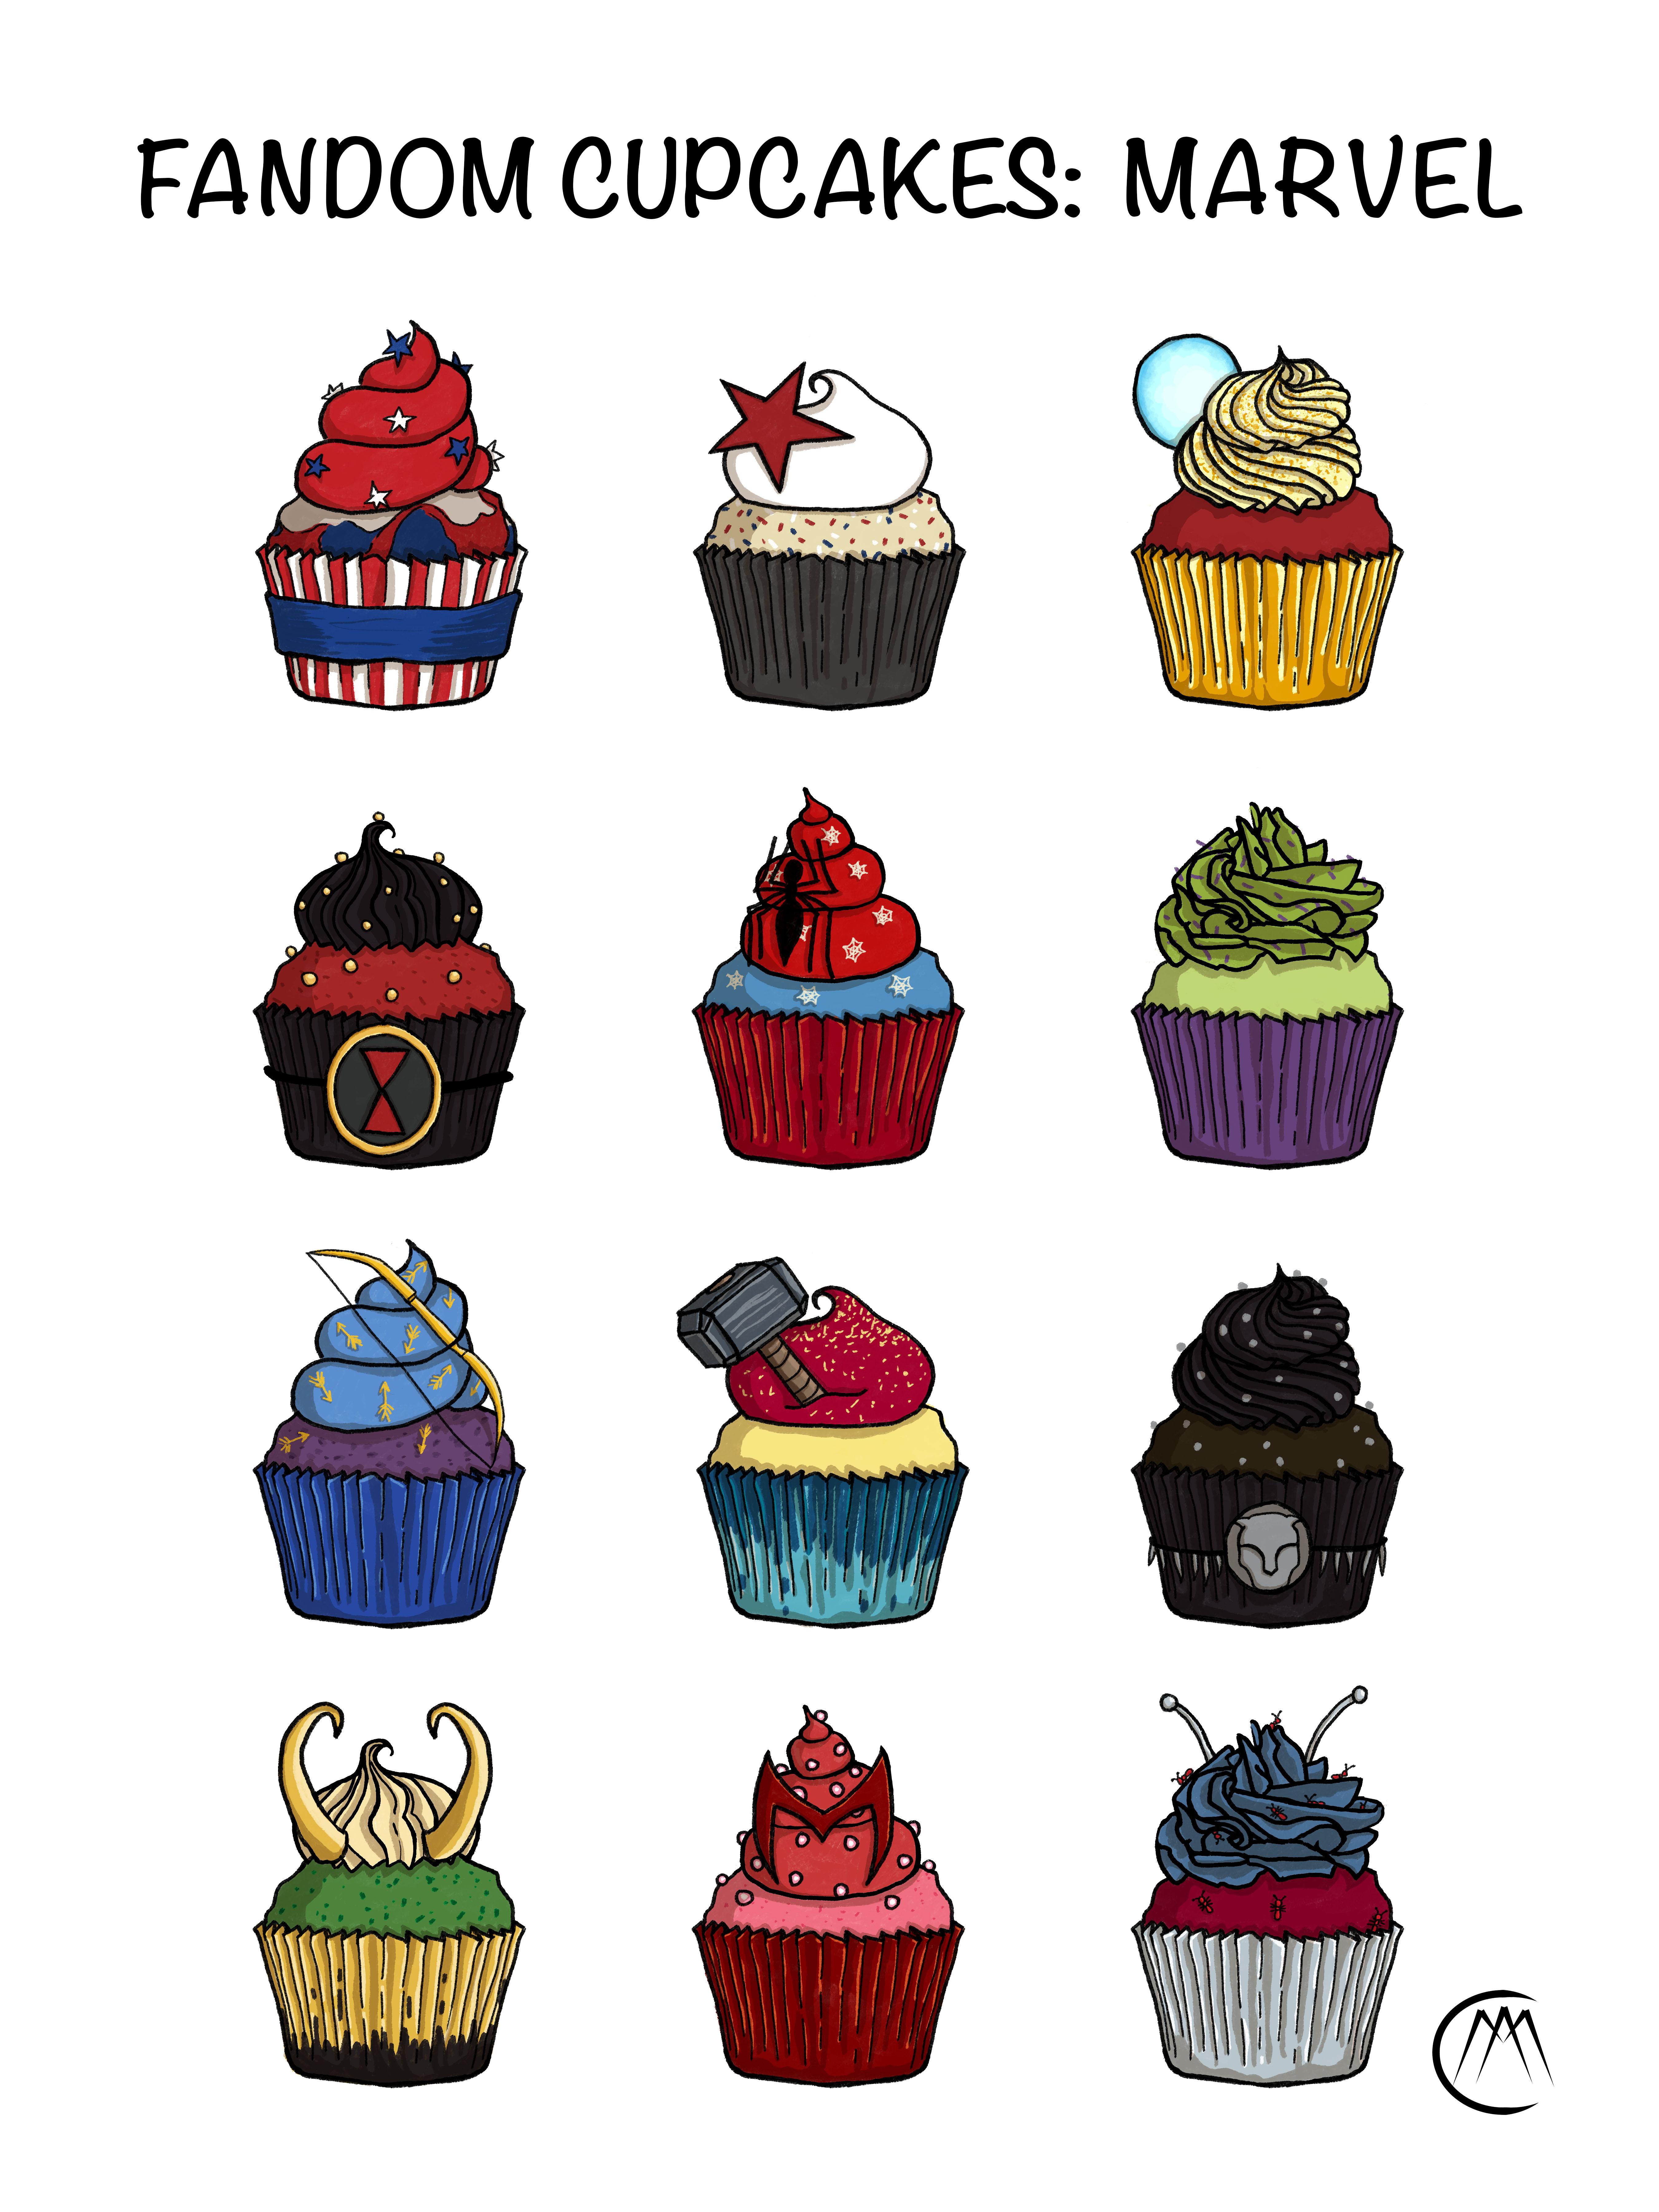 Fandom Cupcakes: Marvel